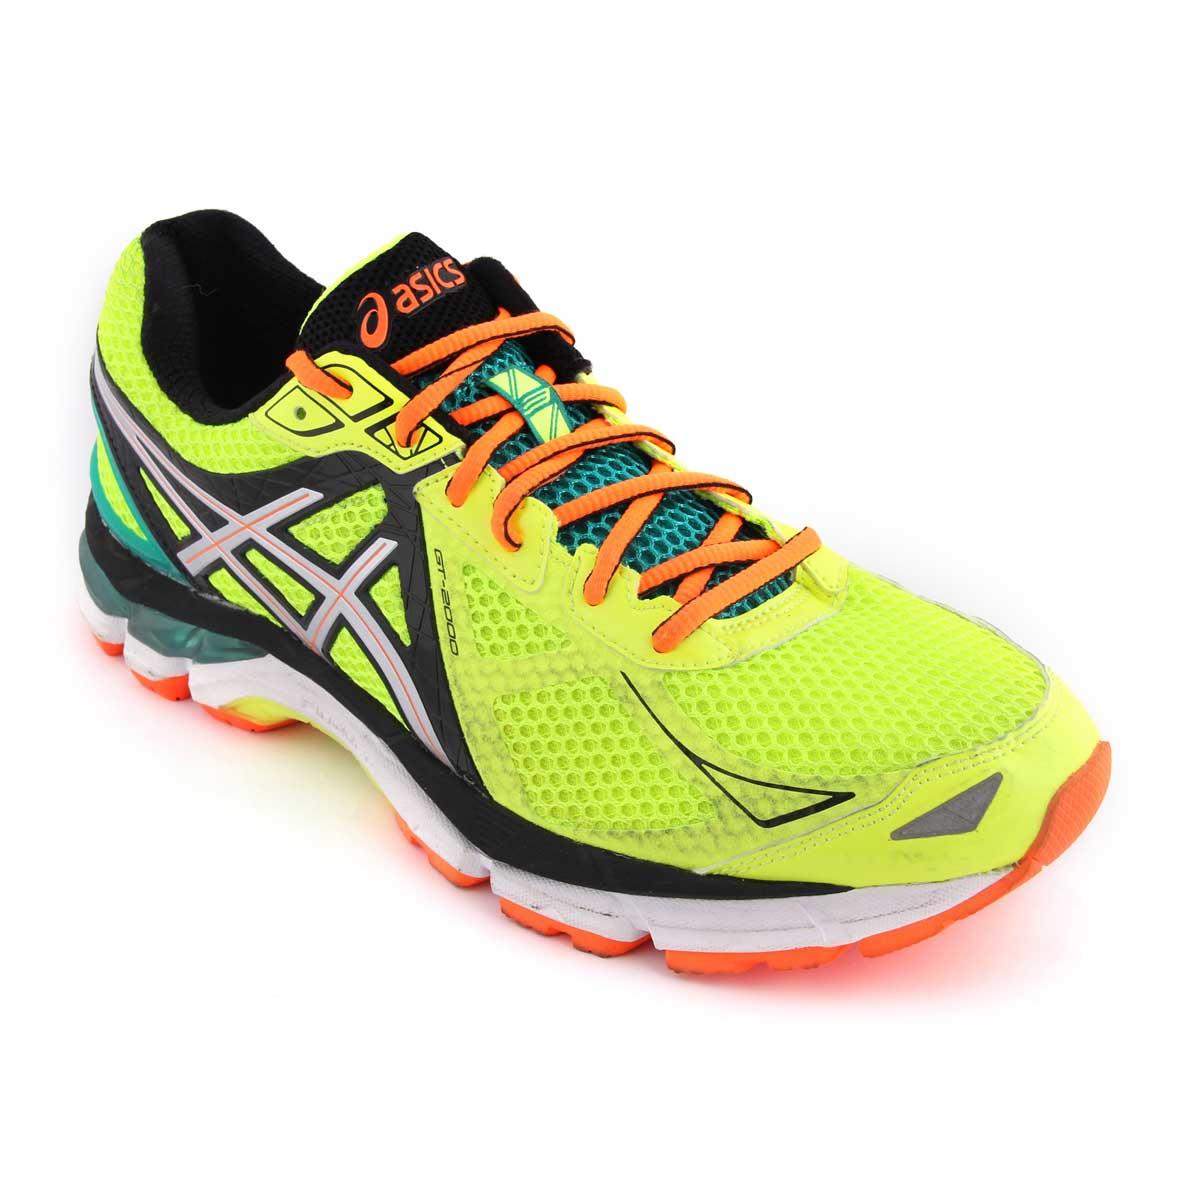 Buy Asics GT-2000 3 Running Shoes